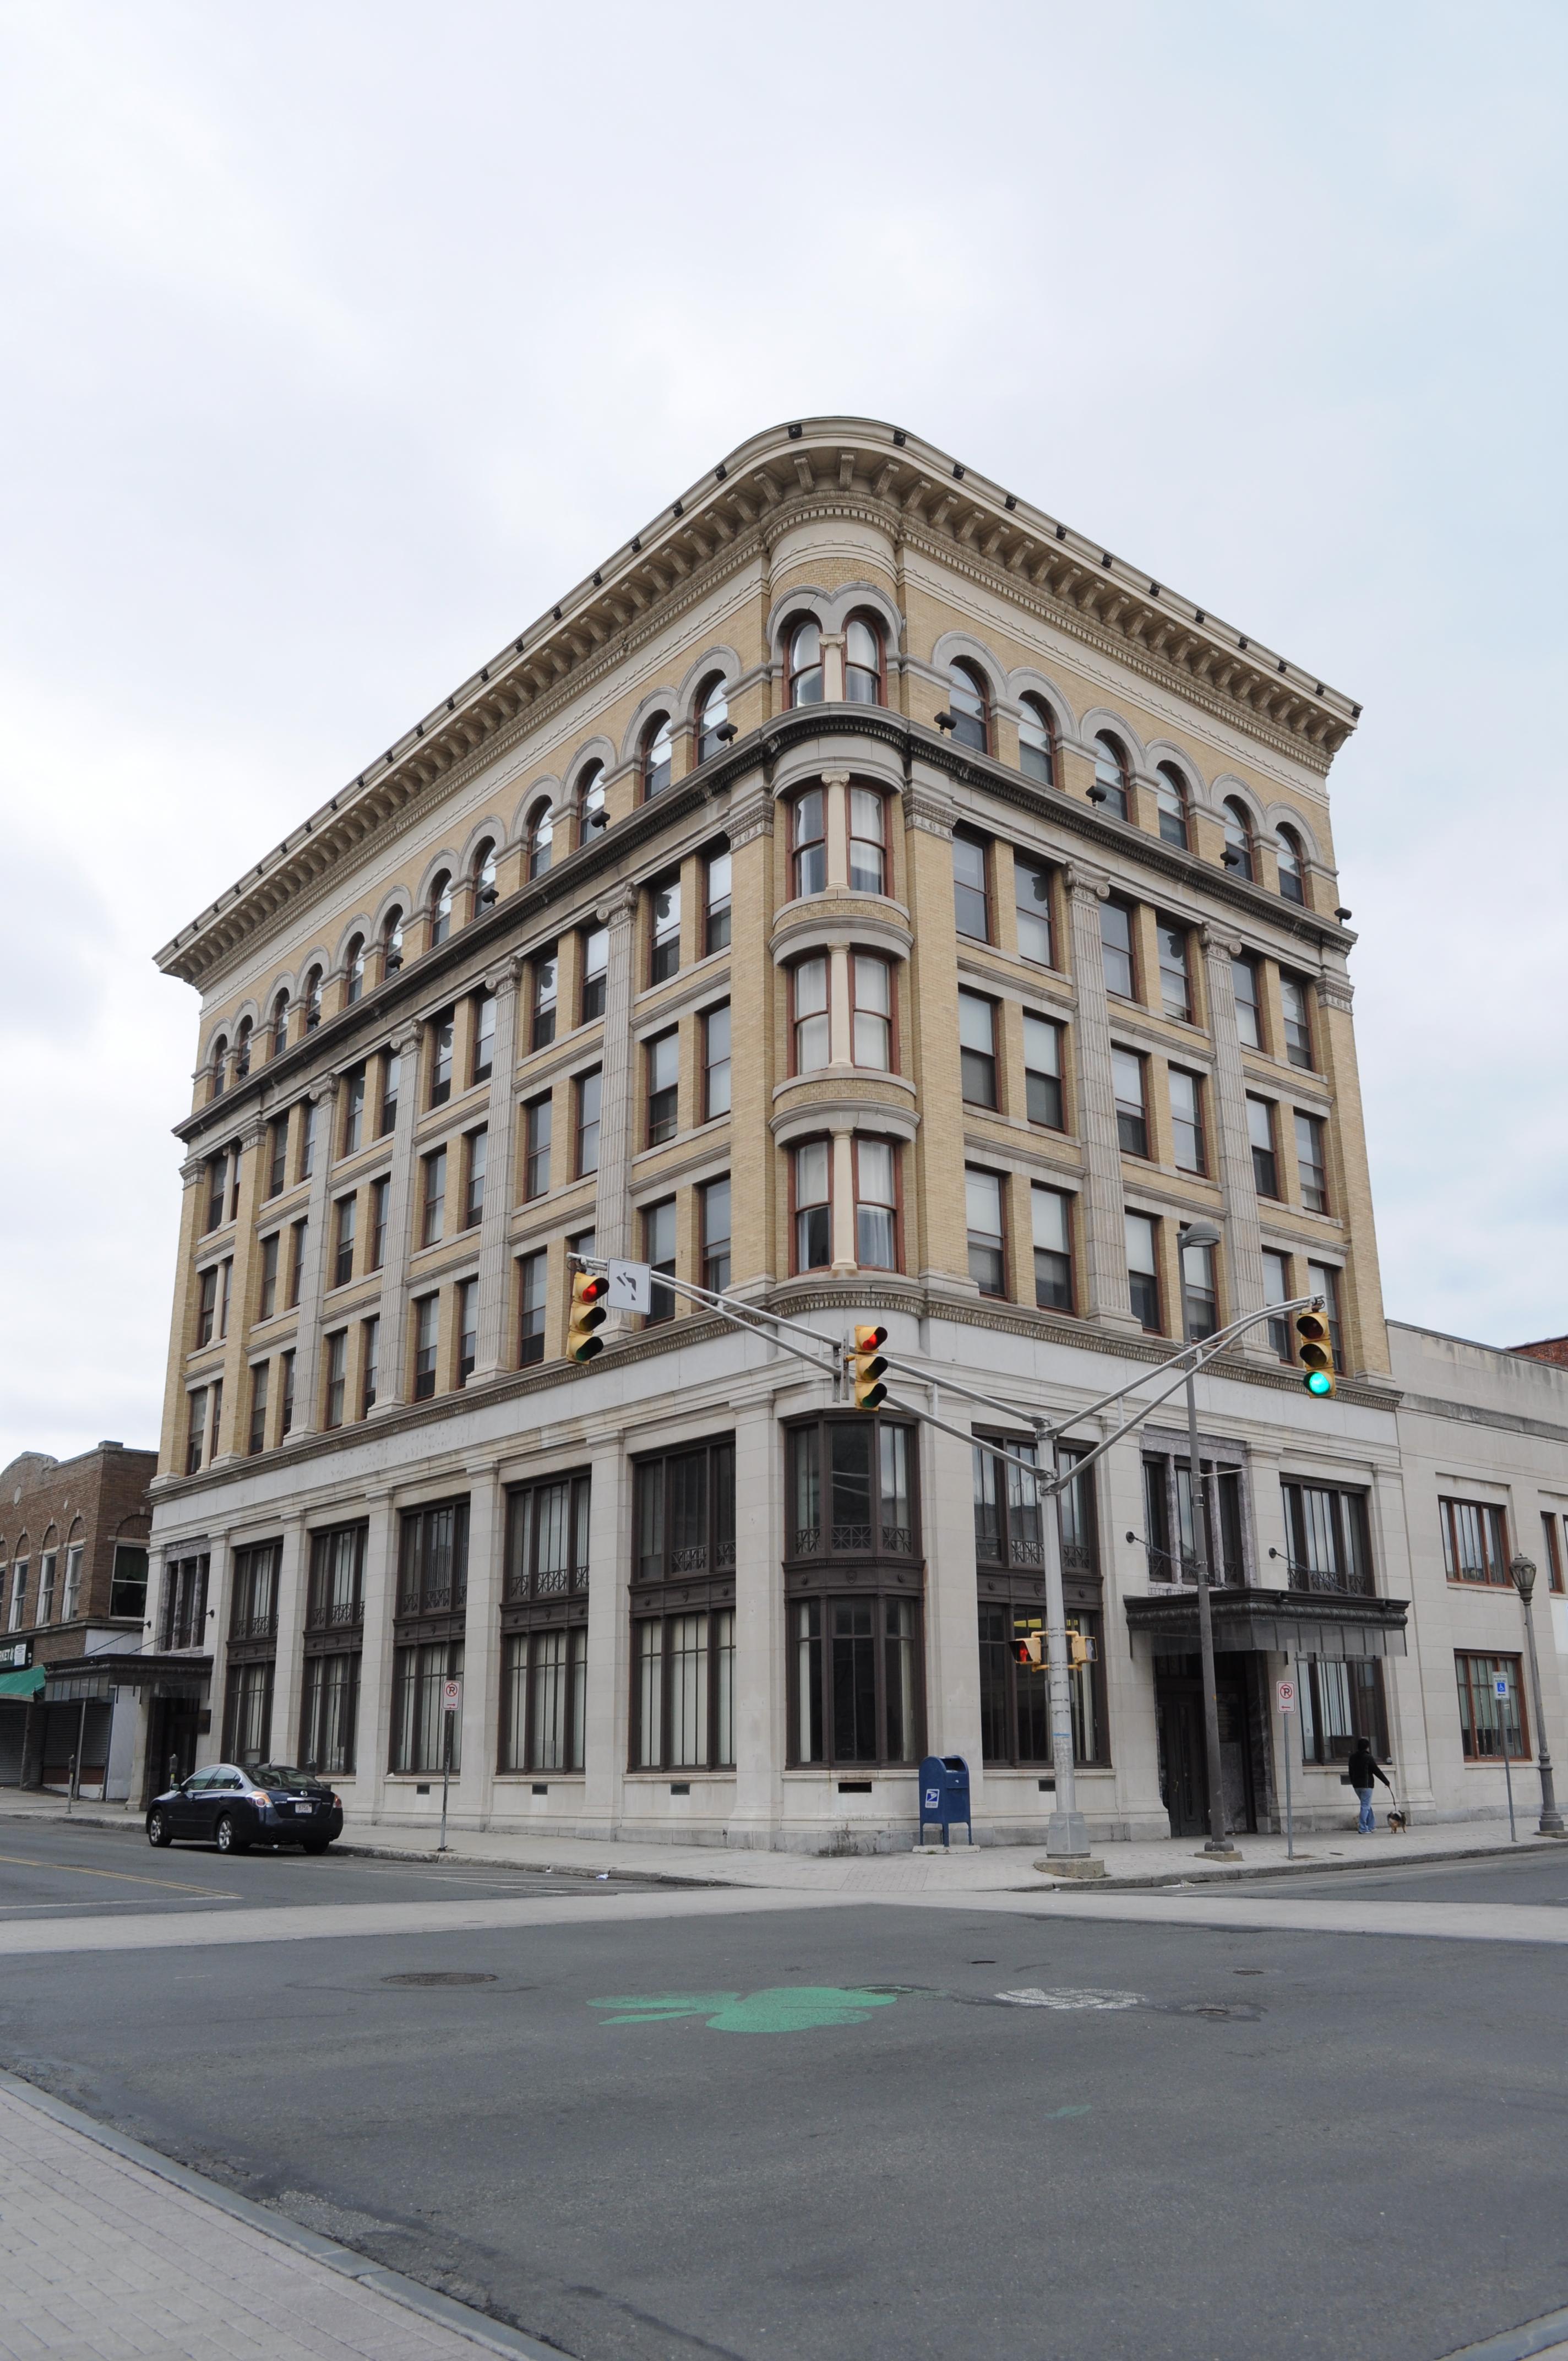 File:Holyoke, MA - Latino Professional Building 01 jpg